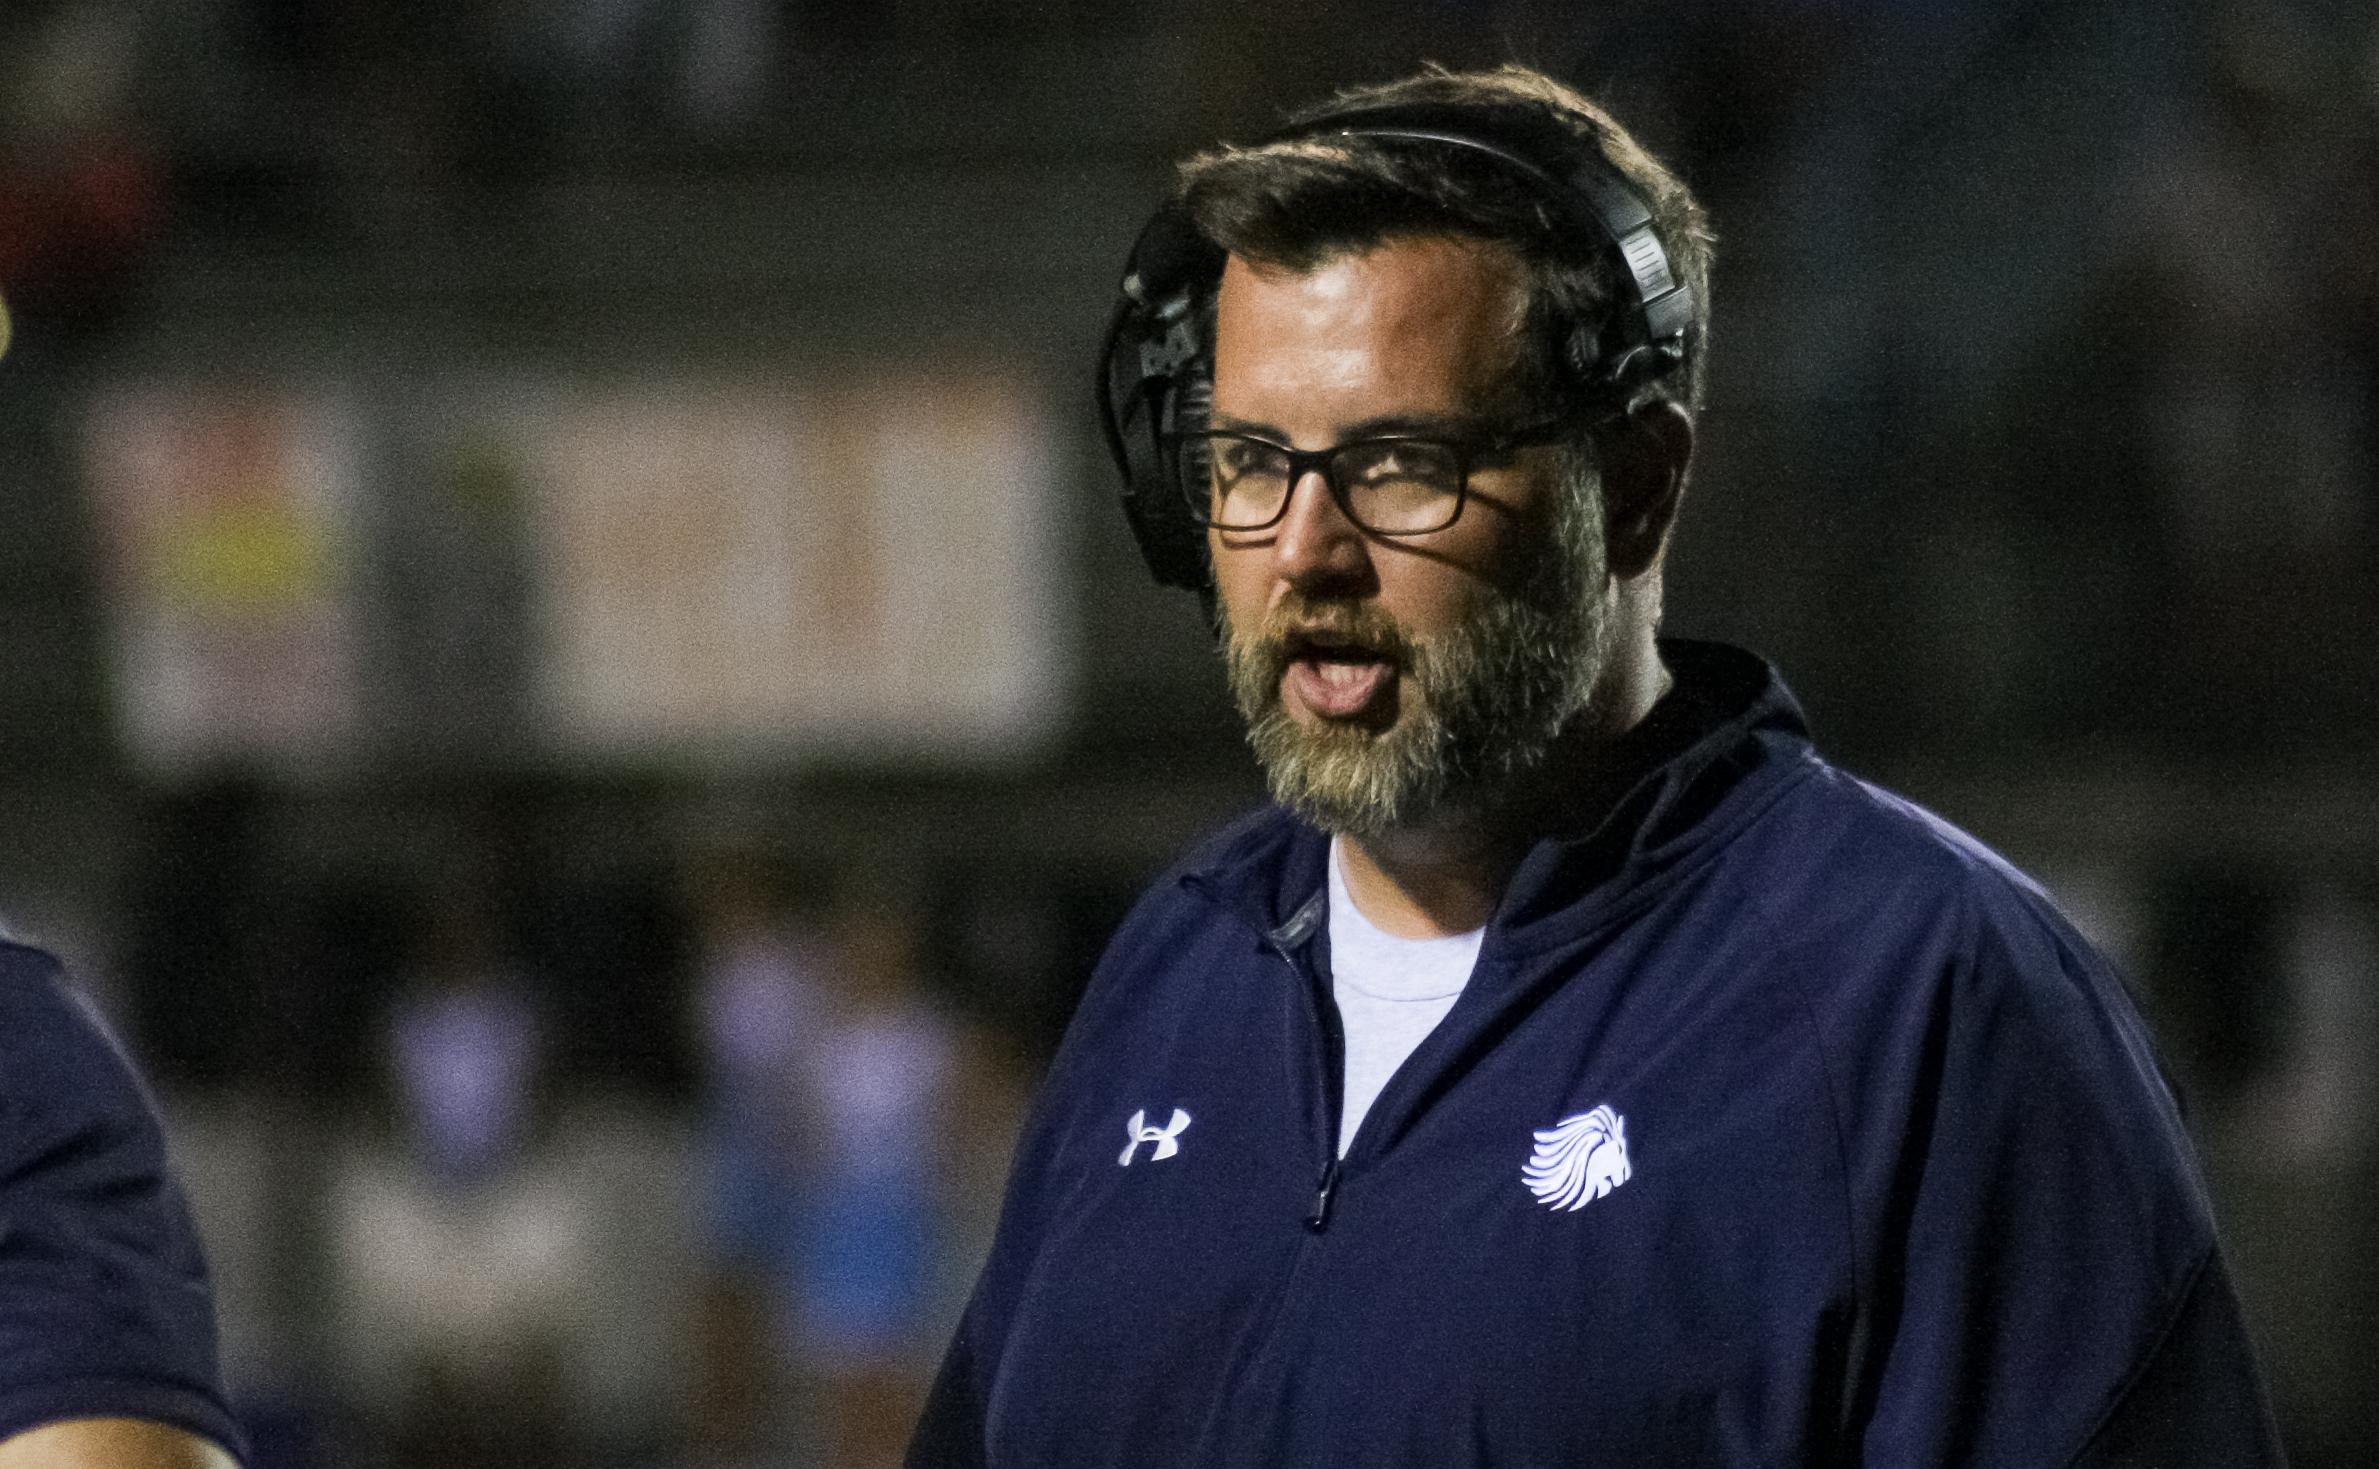 Briarwood Christian head coach Matthew Forester